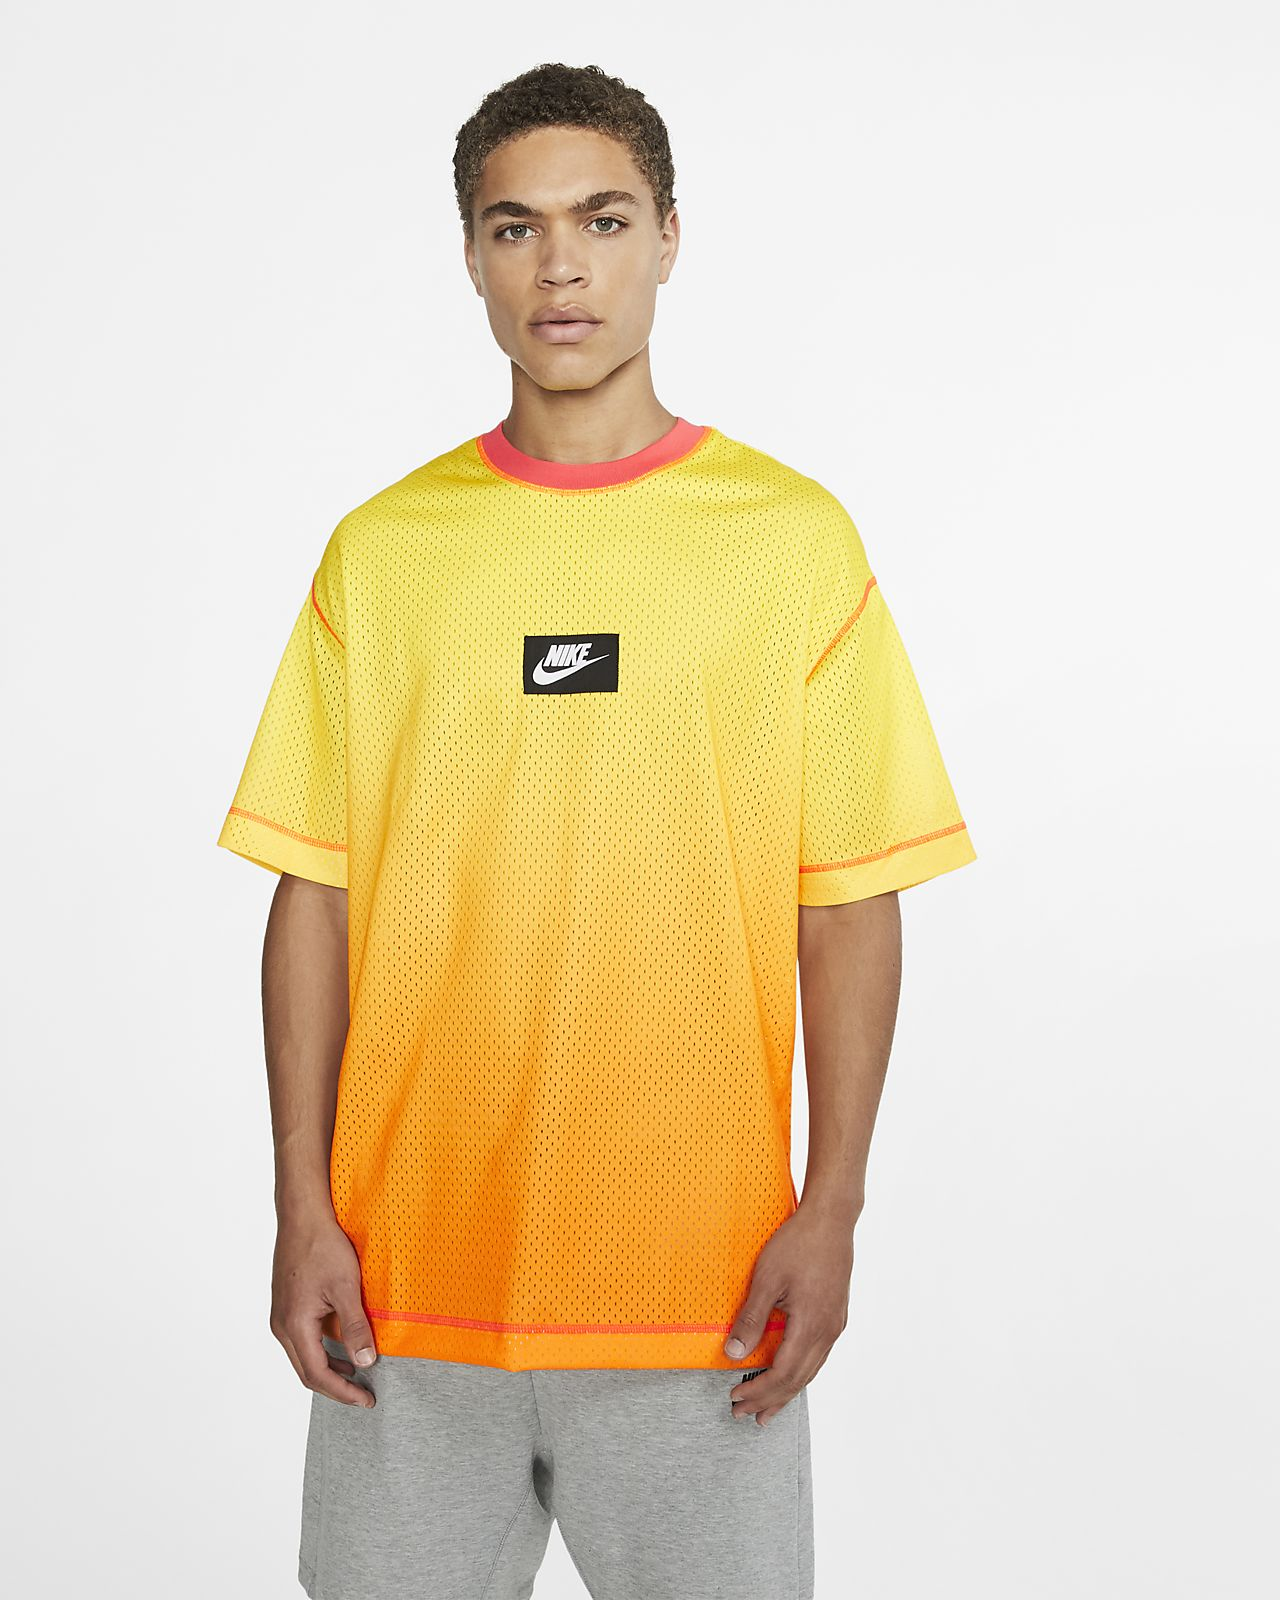 online store f0c58 52fbd ... Kortärmad tröja i mesh Nike Sportswear för män